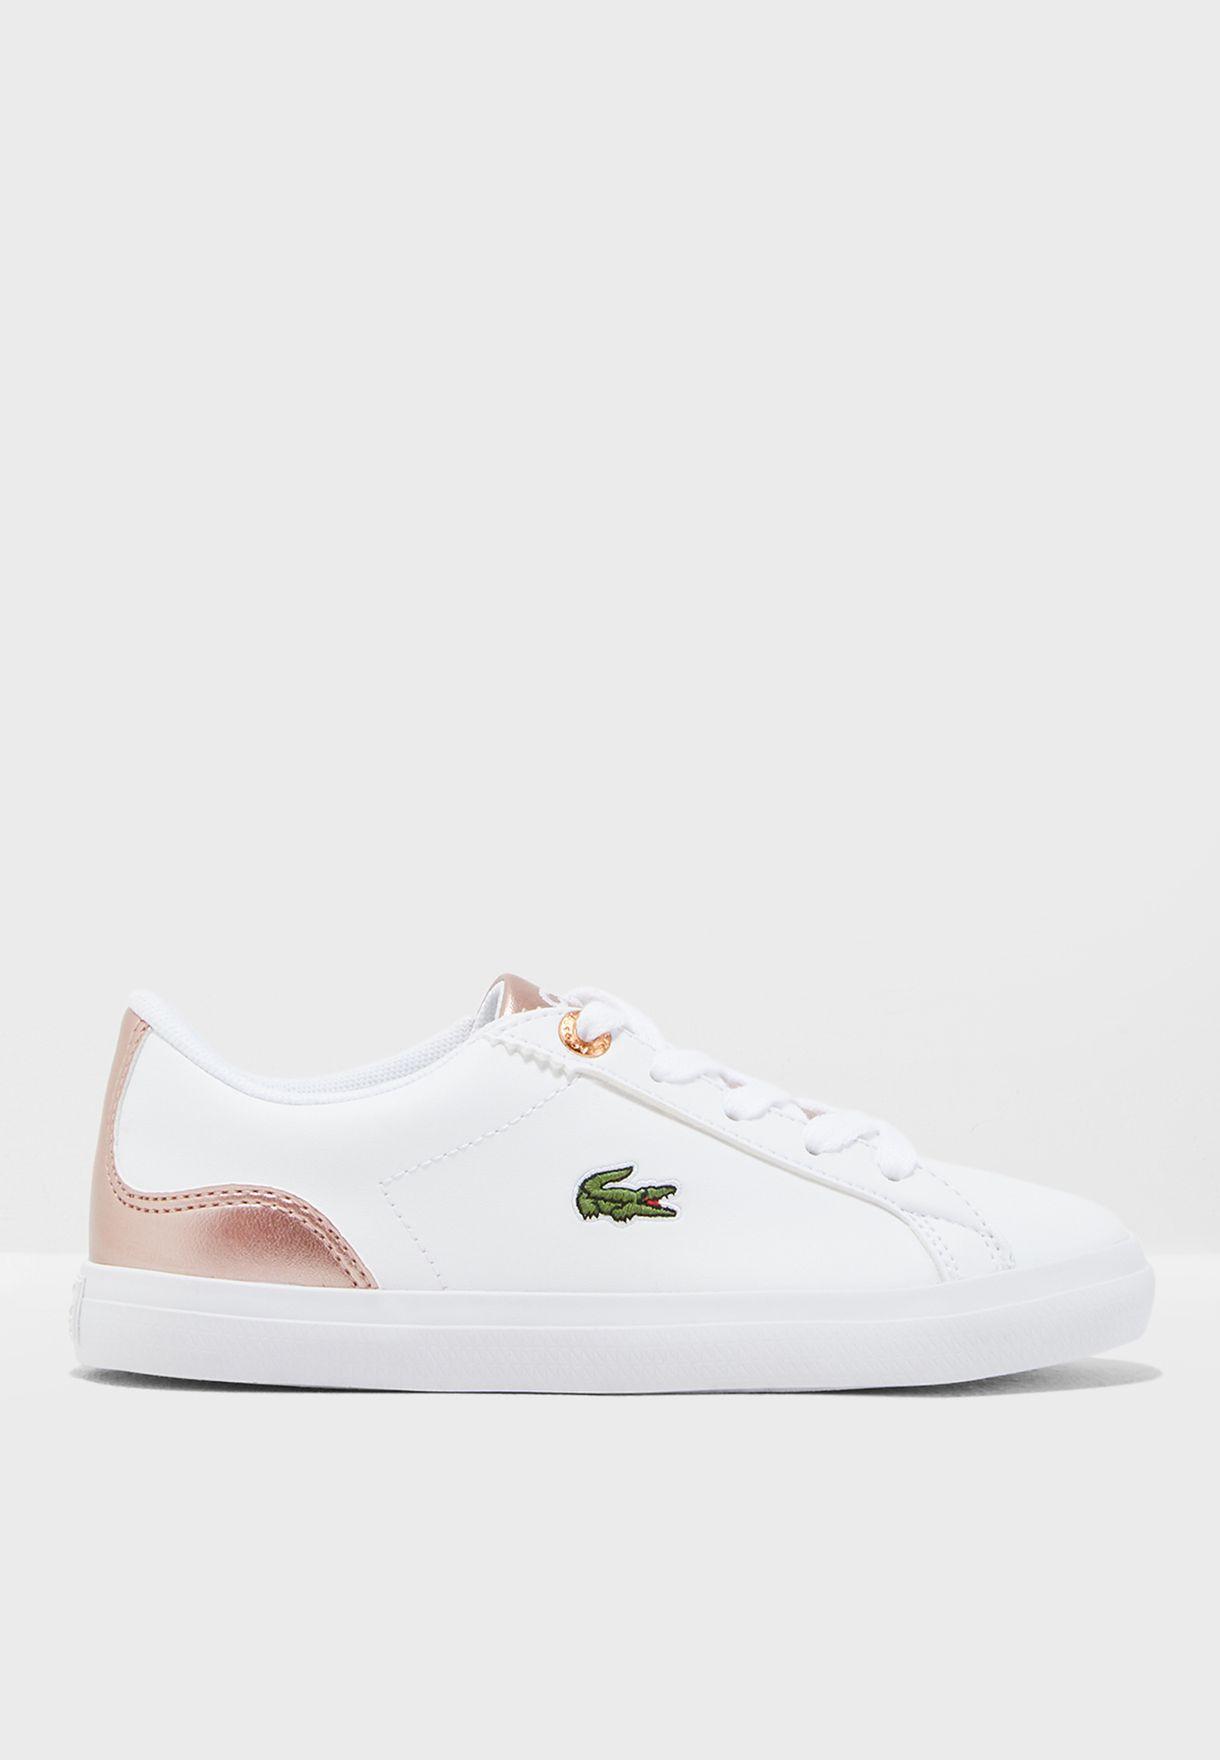 6a5b6b54c7f1 Shop Lacoste white Kids Lerond 318 3 Sneaker 36CAC0014-B53 for Kids ...